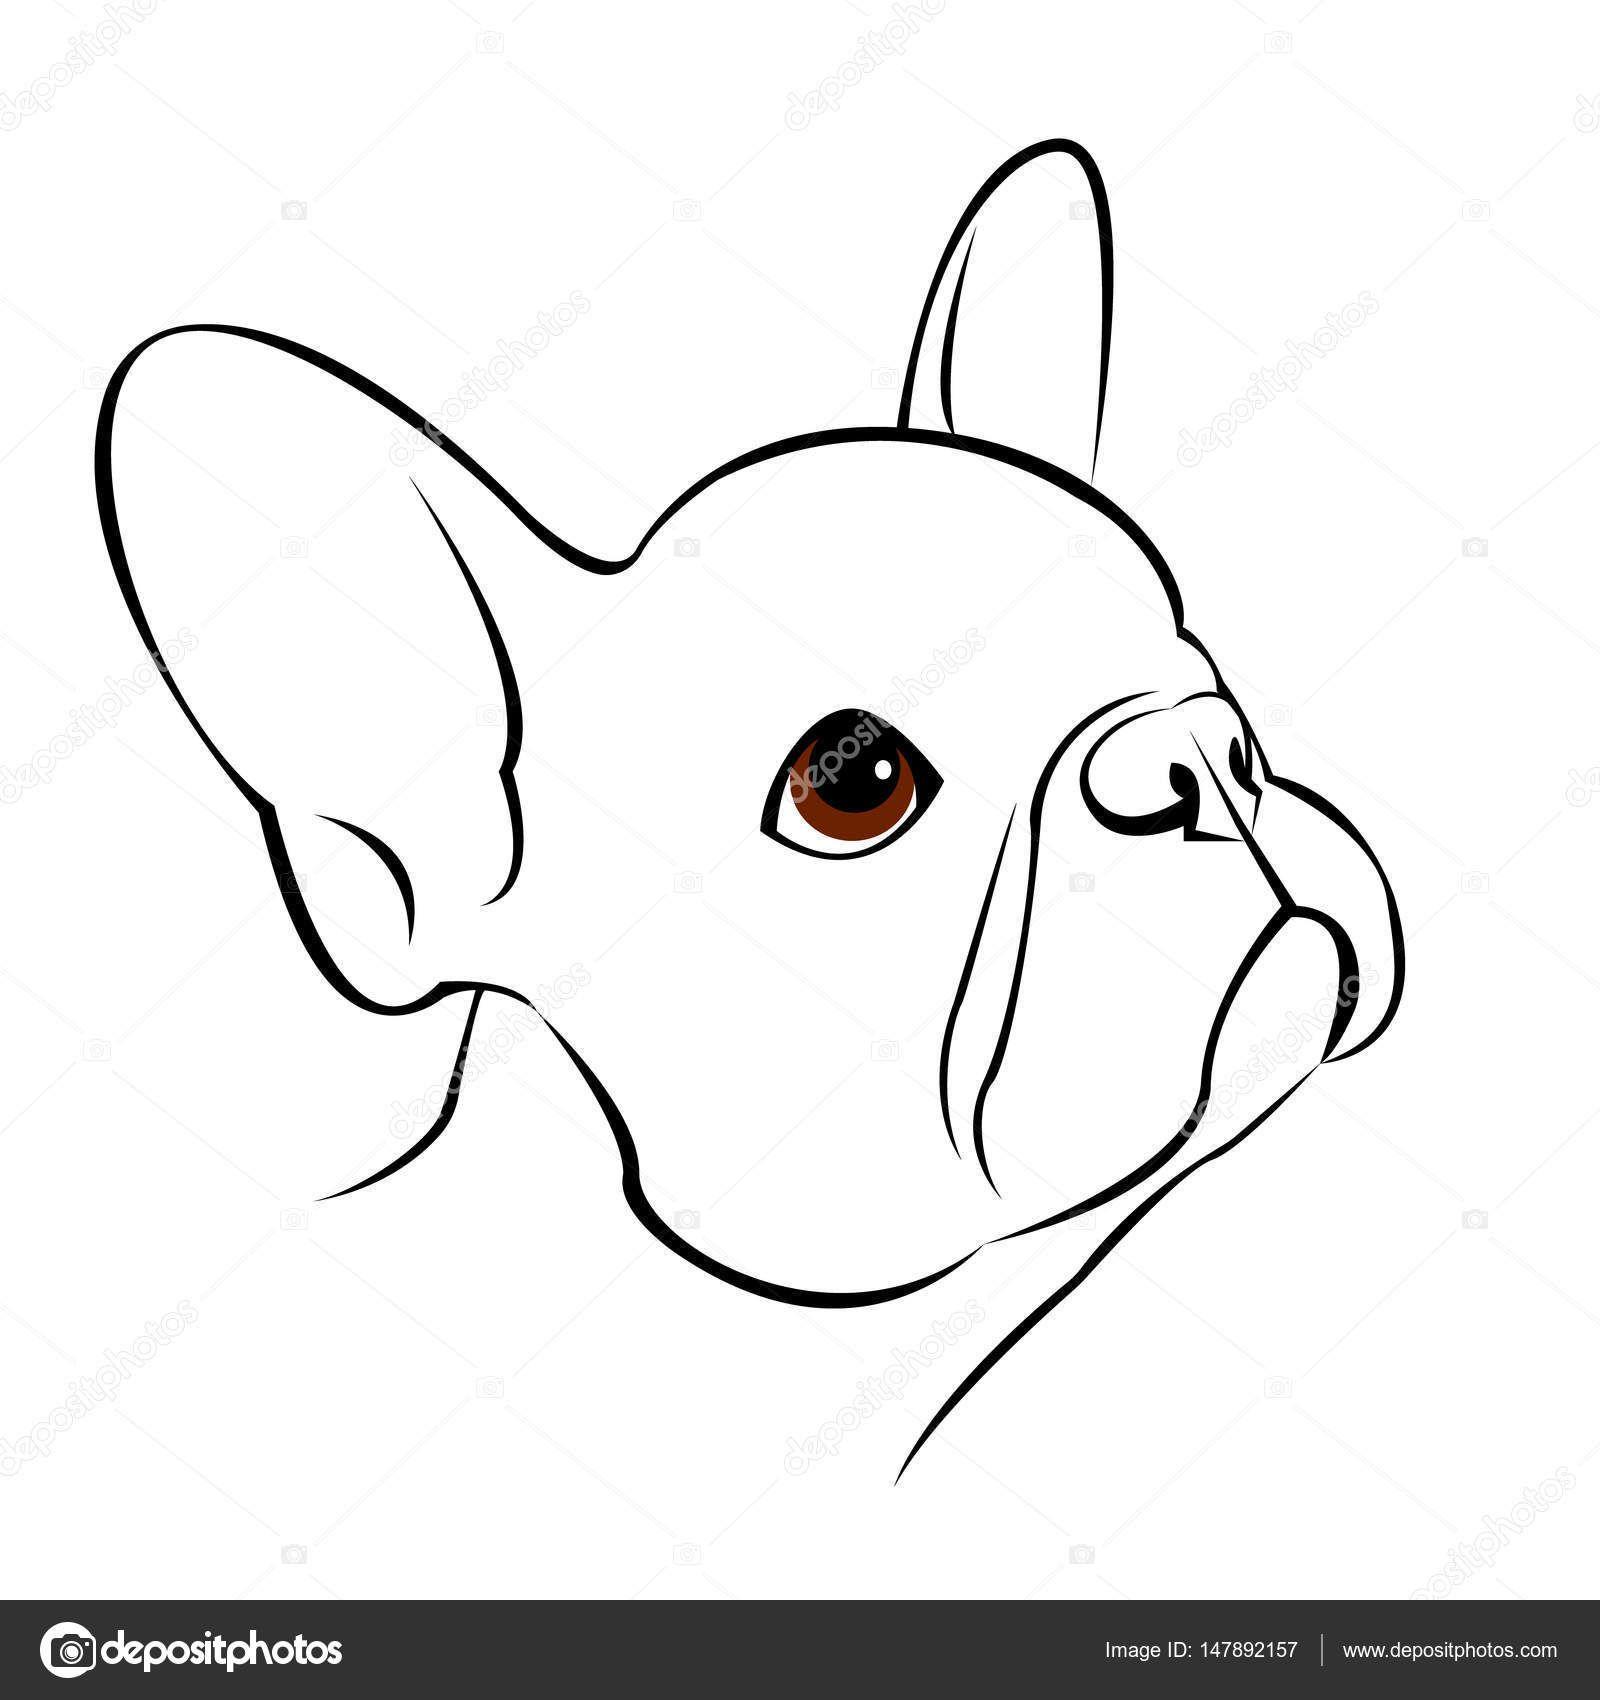 Imagem Relacionada Bulldog Frances Dibujo Tatuaje Bulldog Frances Tatuaje Bulldog